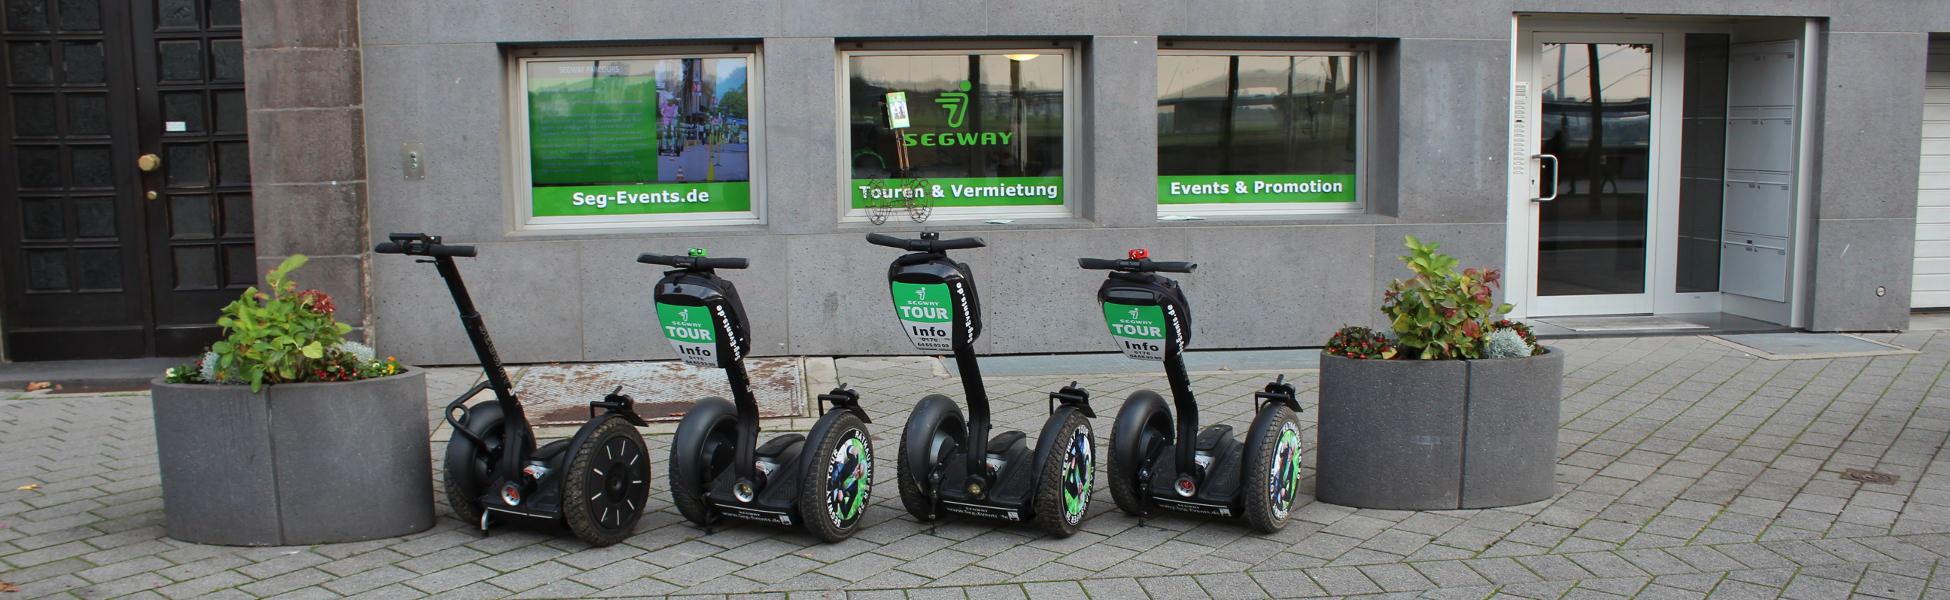 Segway tours Germany